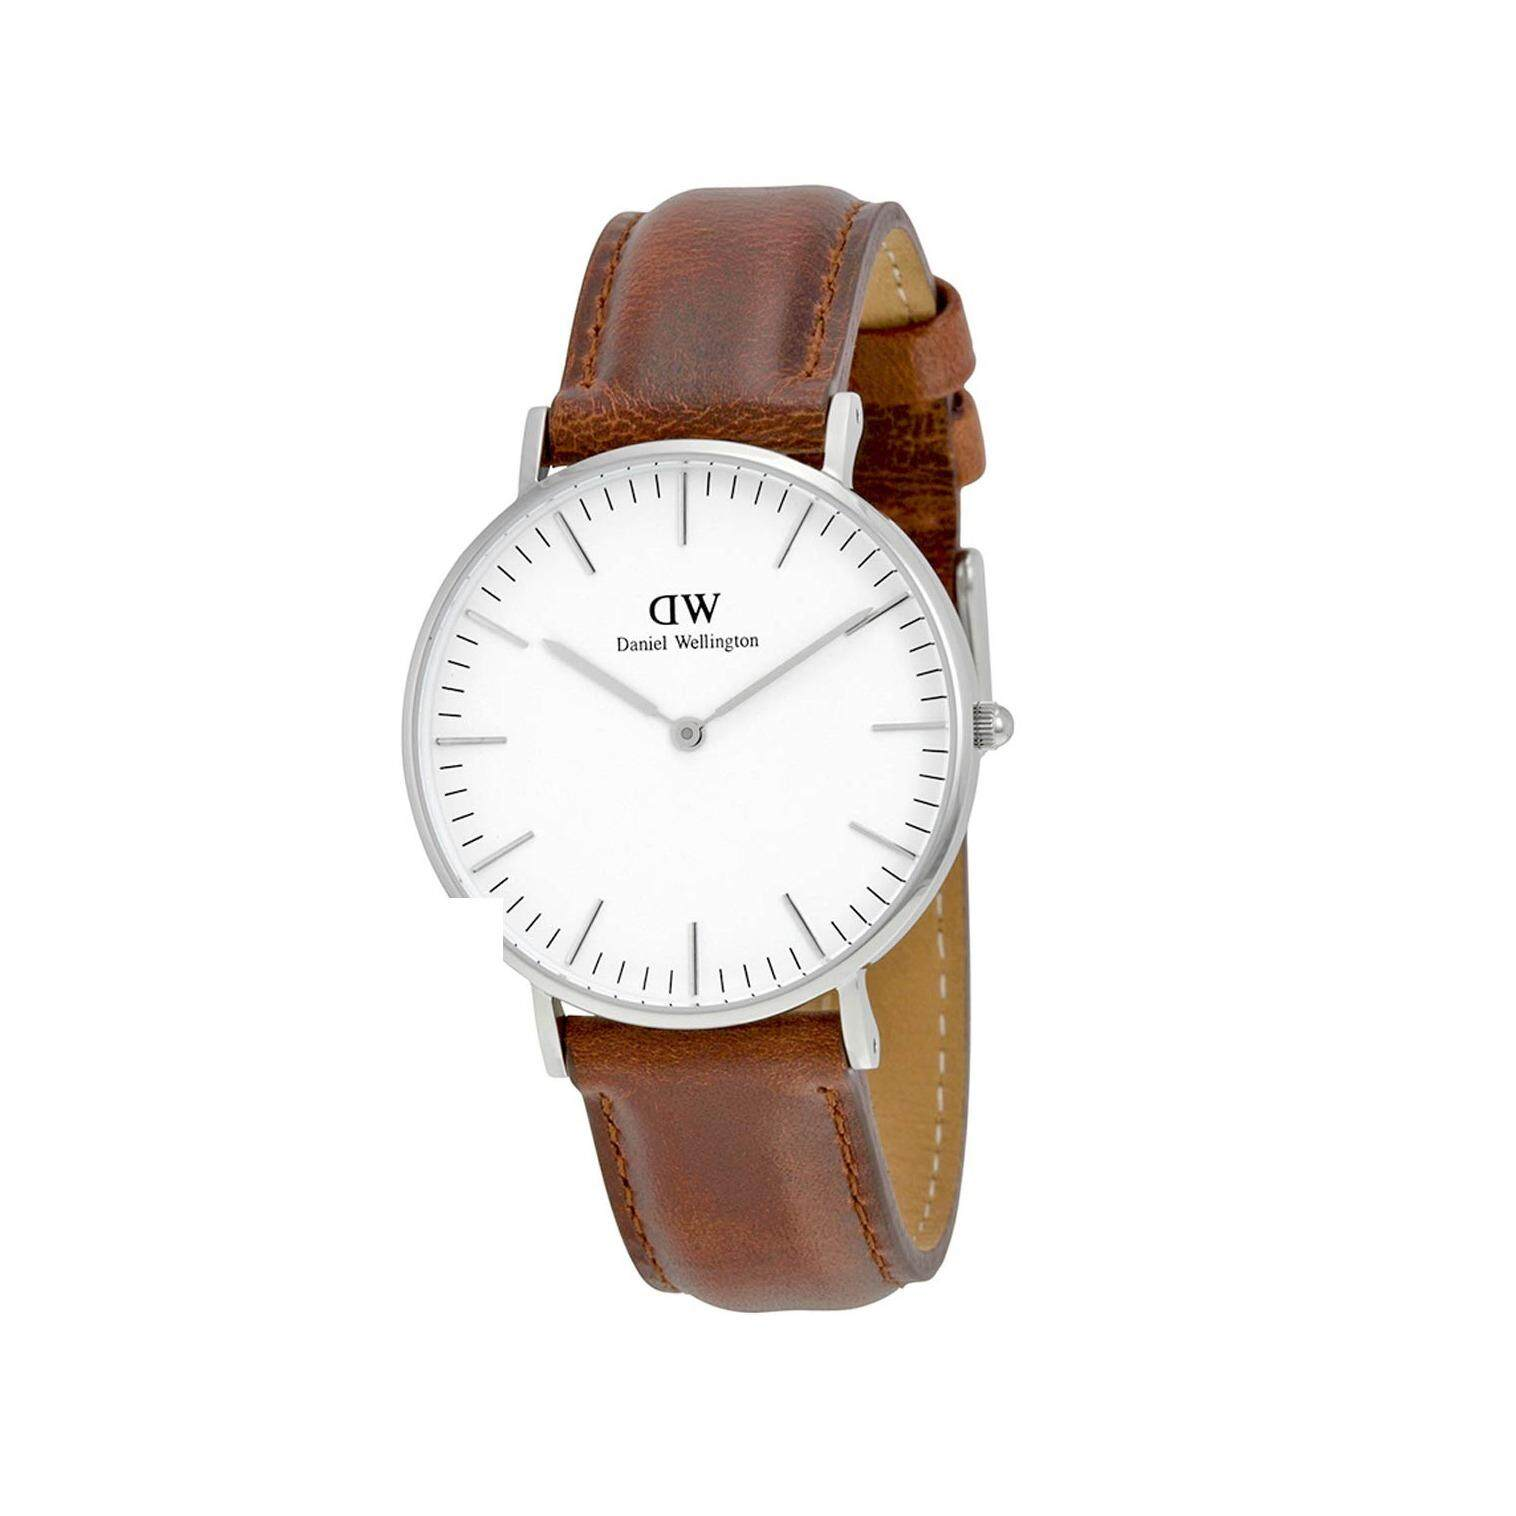 Daniel Wellington 0607Dw Classic St Mawes 36Mm นาฬิกาข้อมือ แฟชั่น ผู้หญิง สายหนัง สีน้ำตาล Women Watch Brown ใน สมุทรปราการ